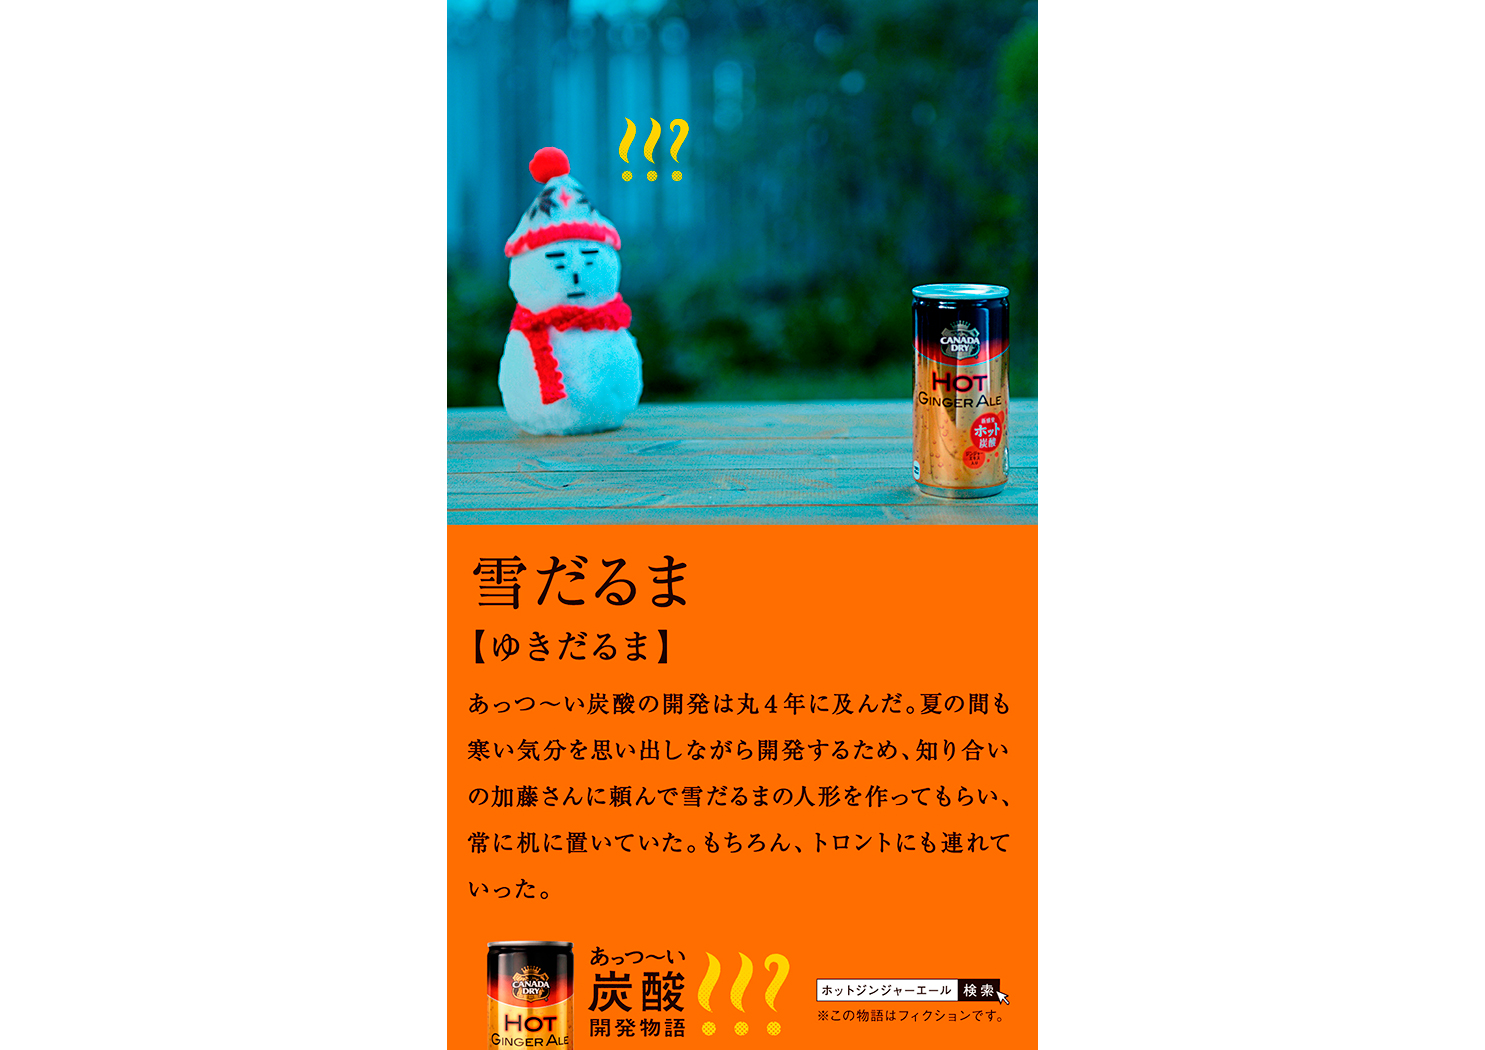 CANADA DRY Hot Ginger Ale Digital Signage